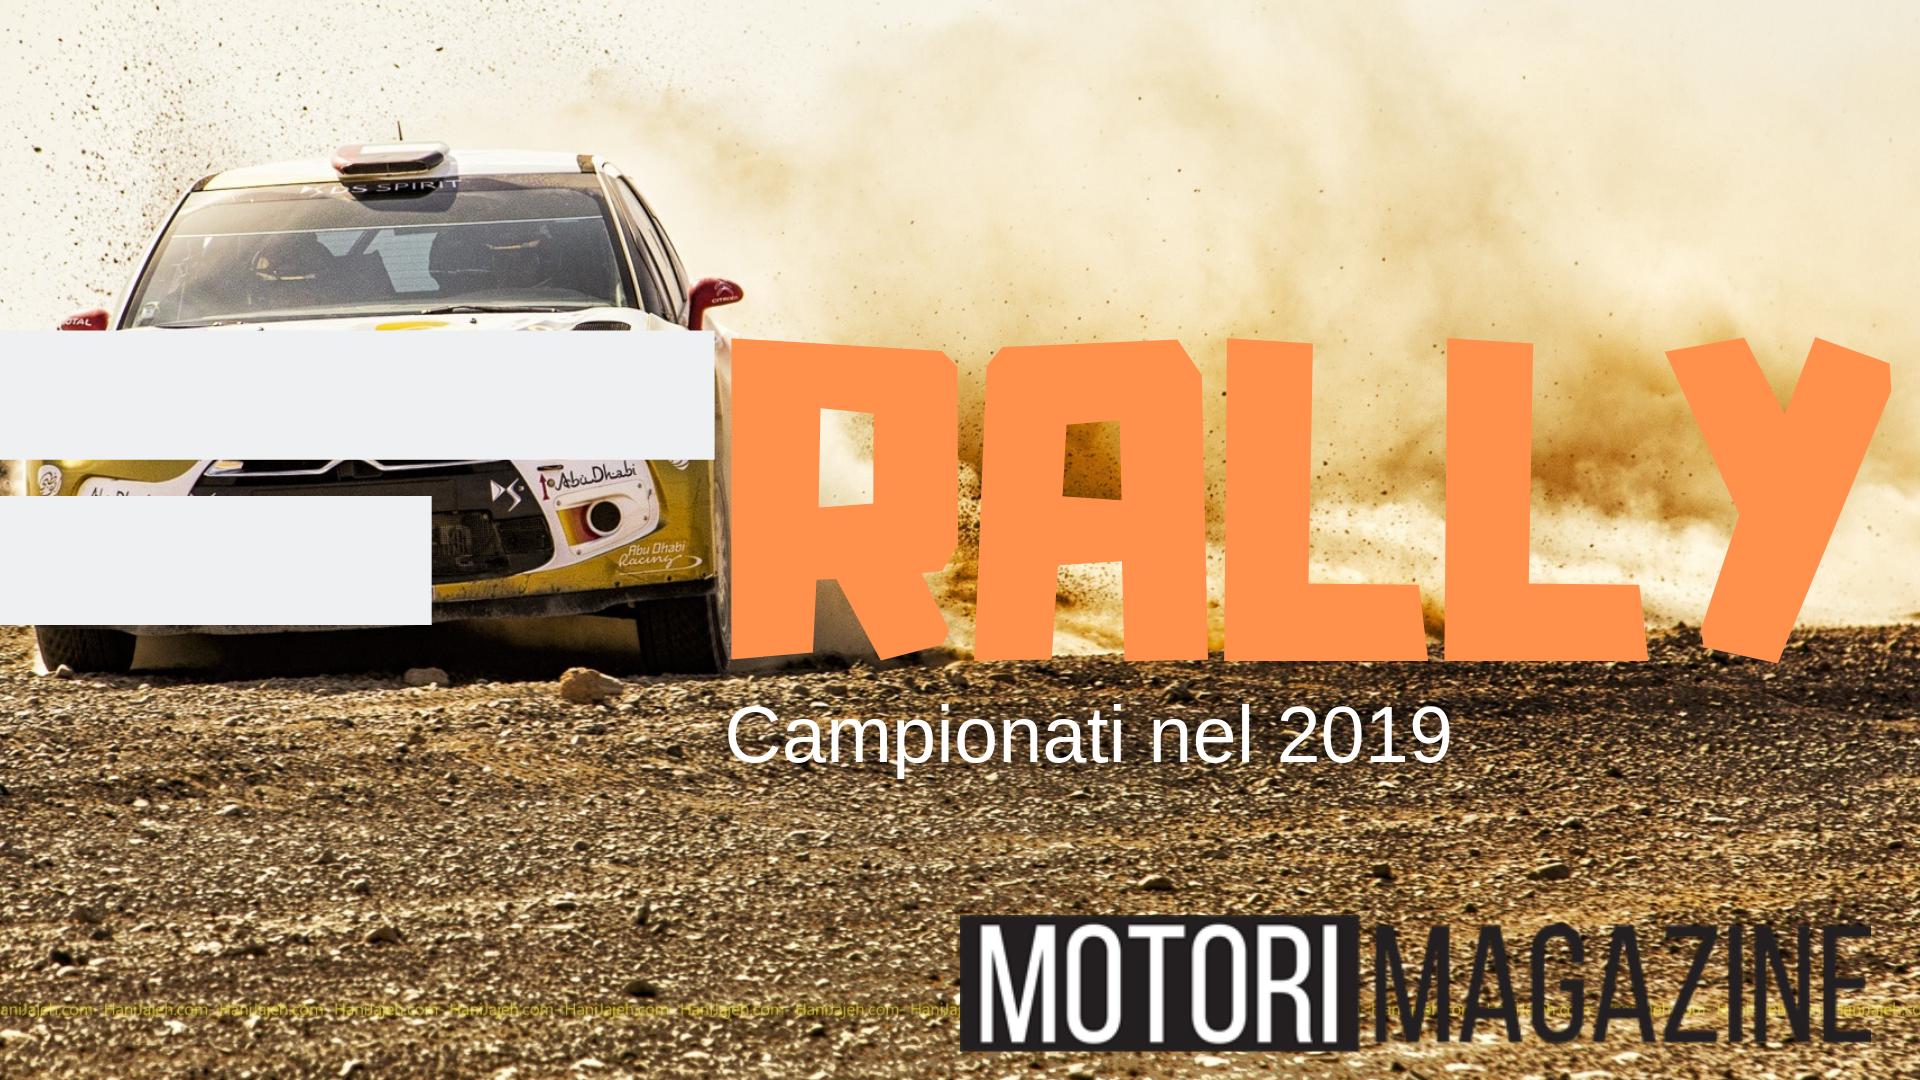 Corse Cavalli Milano Calendario.Calendario Rally 2019 Stay Tuned Motori Magazine